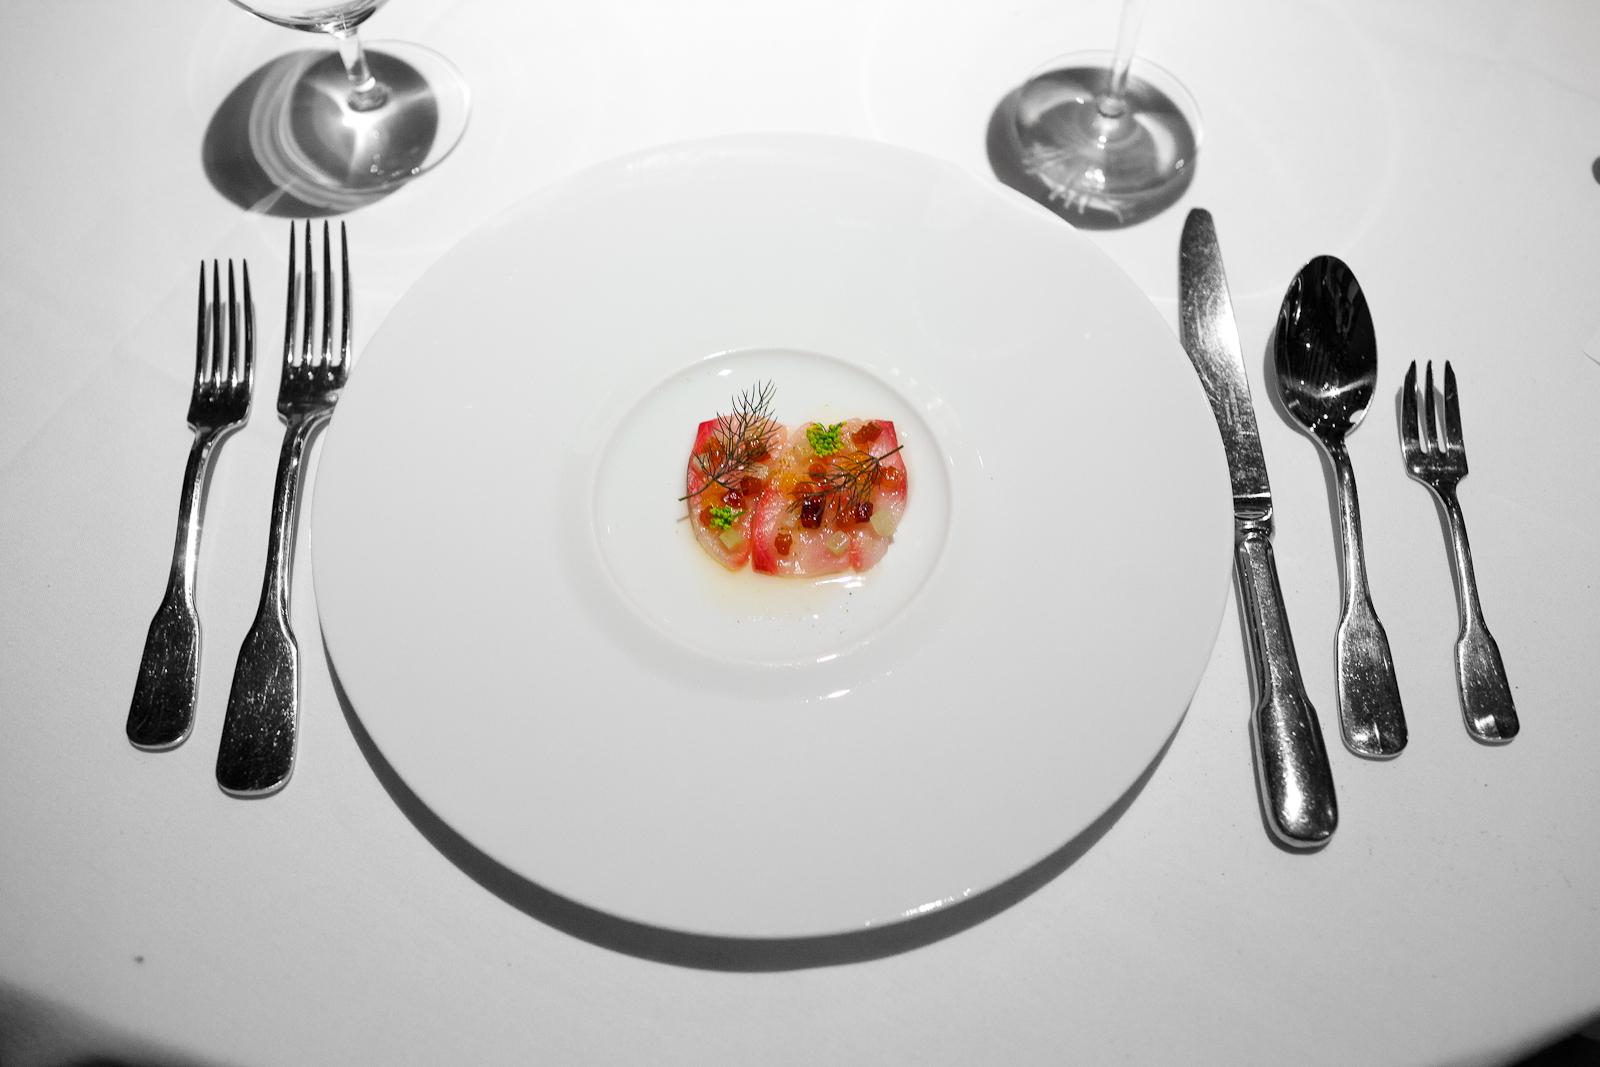 2nd Course: Hamachi crudo with compressed fennel, fennel fronds, and a lardo vinaigrette